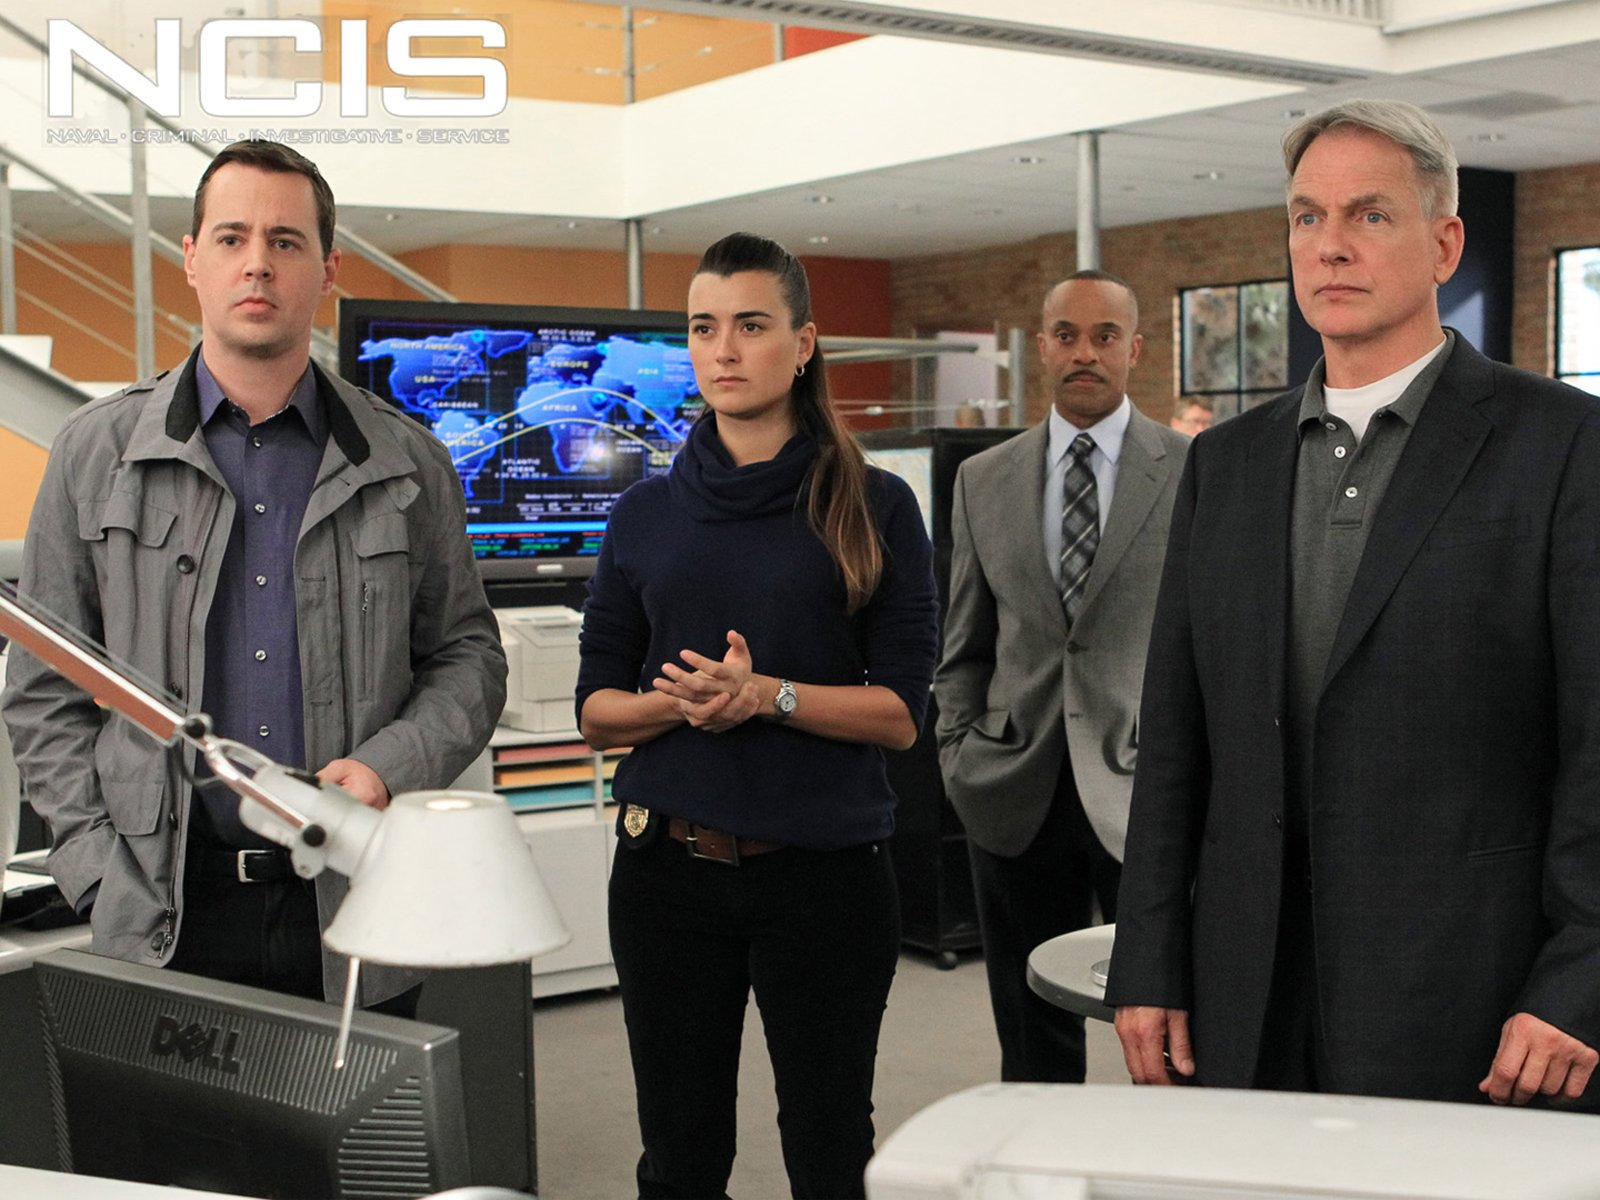 ncis season 10 episode 22 revenge watch online